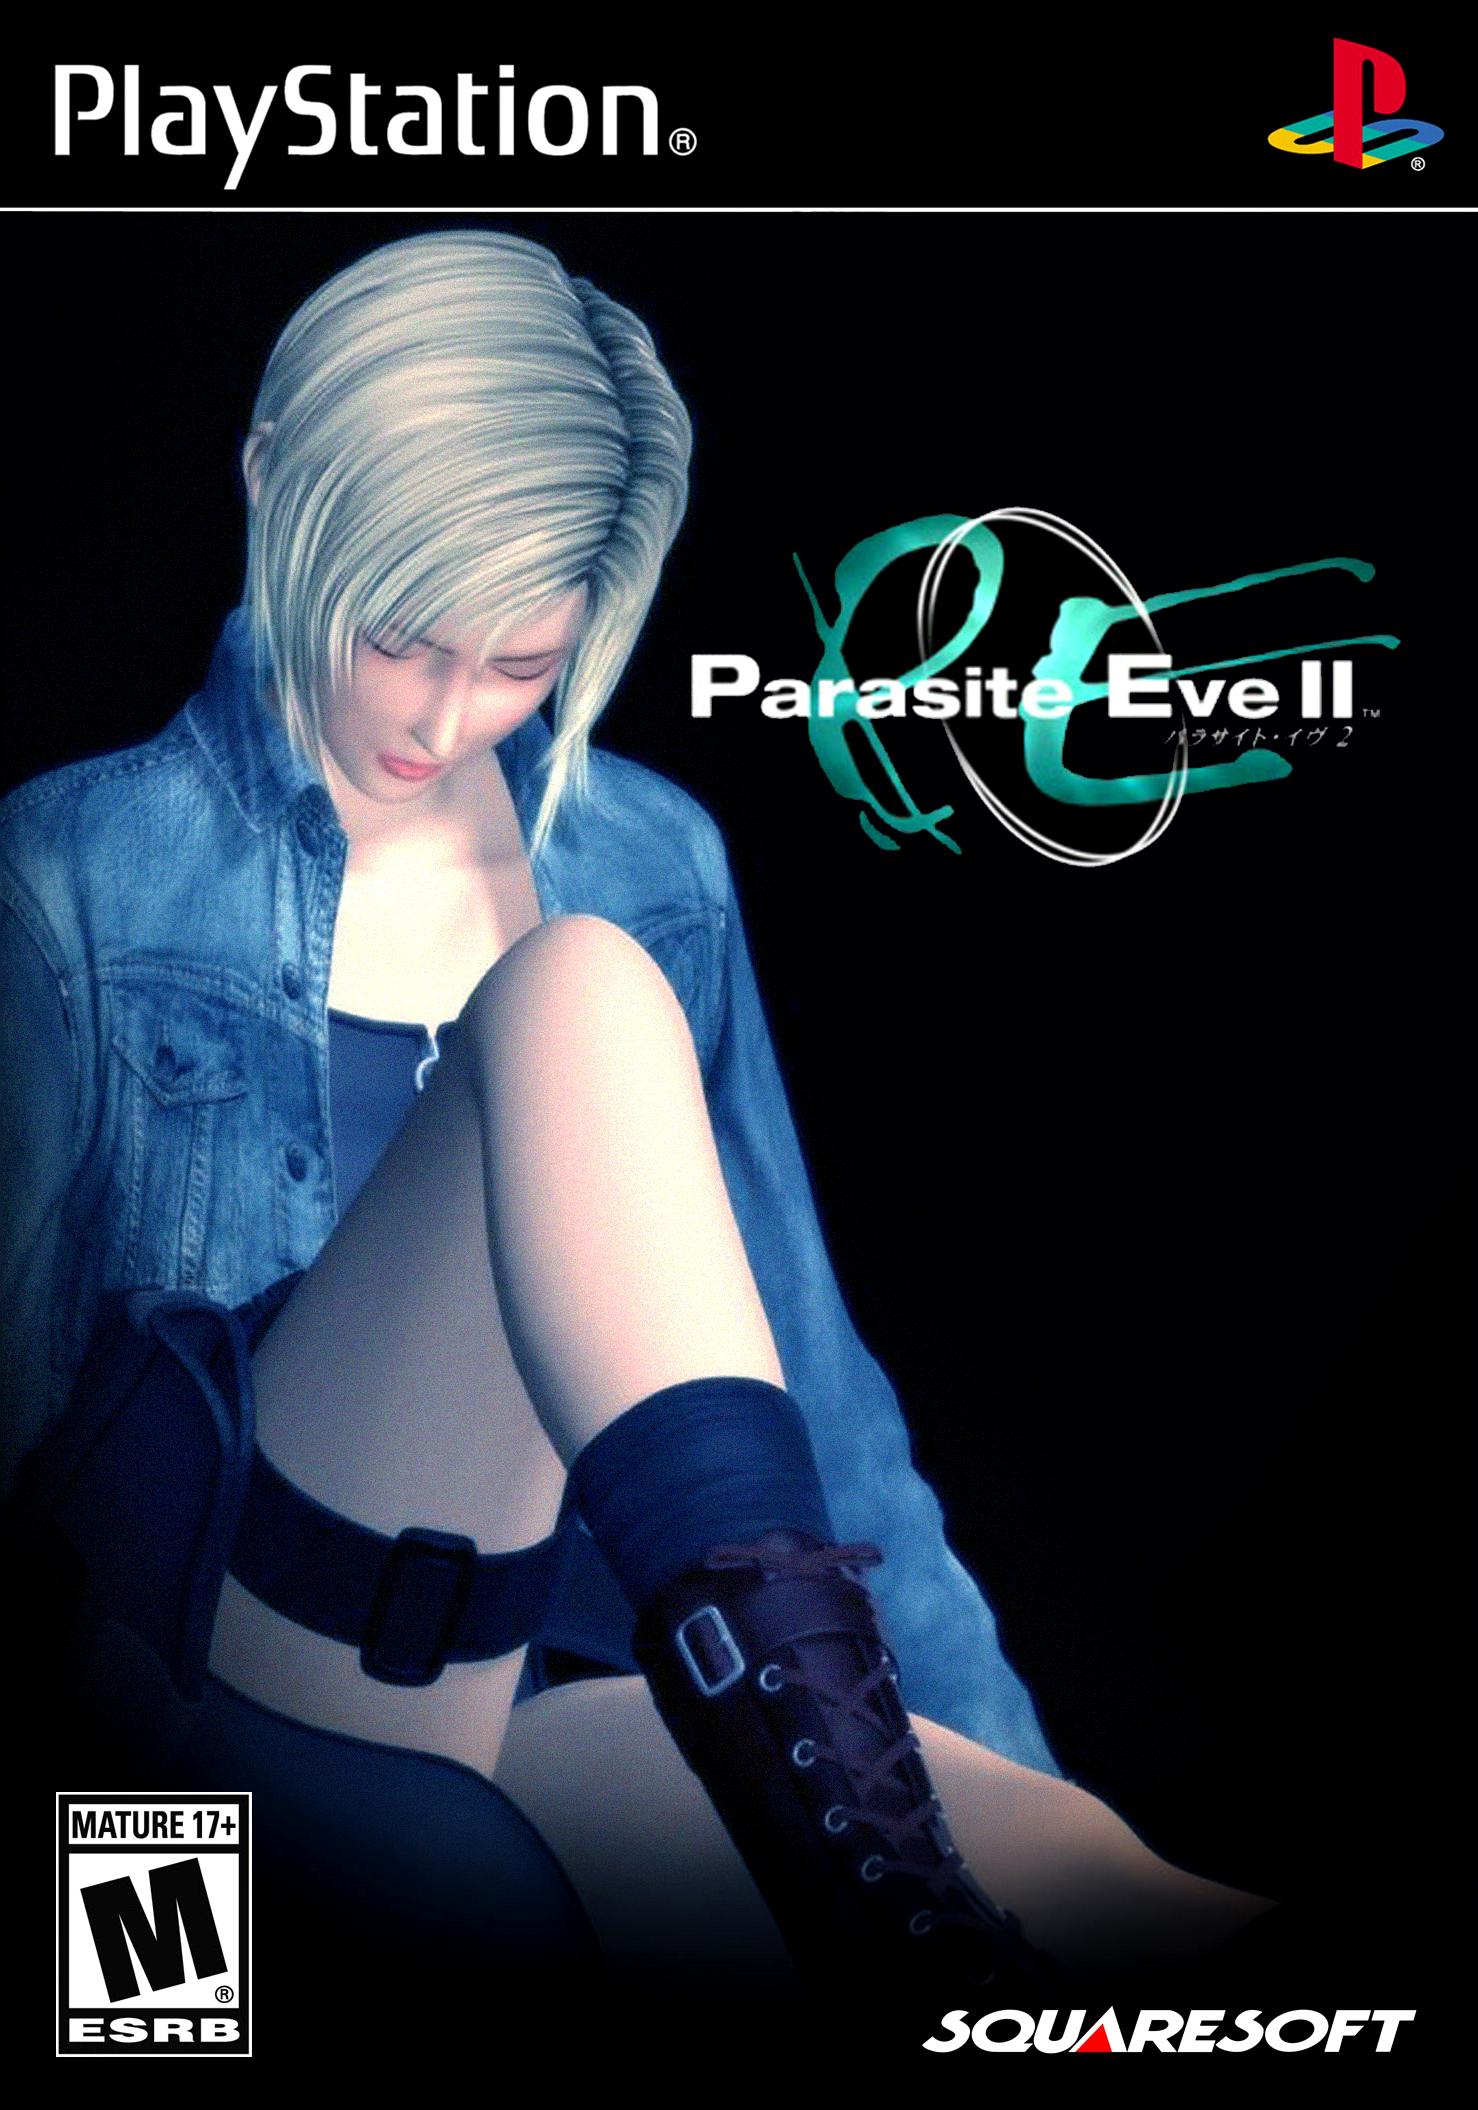 parasite eve ii details